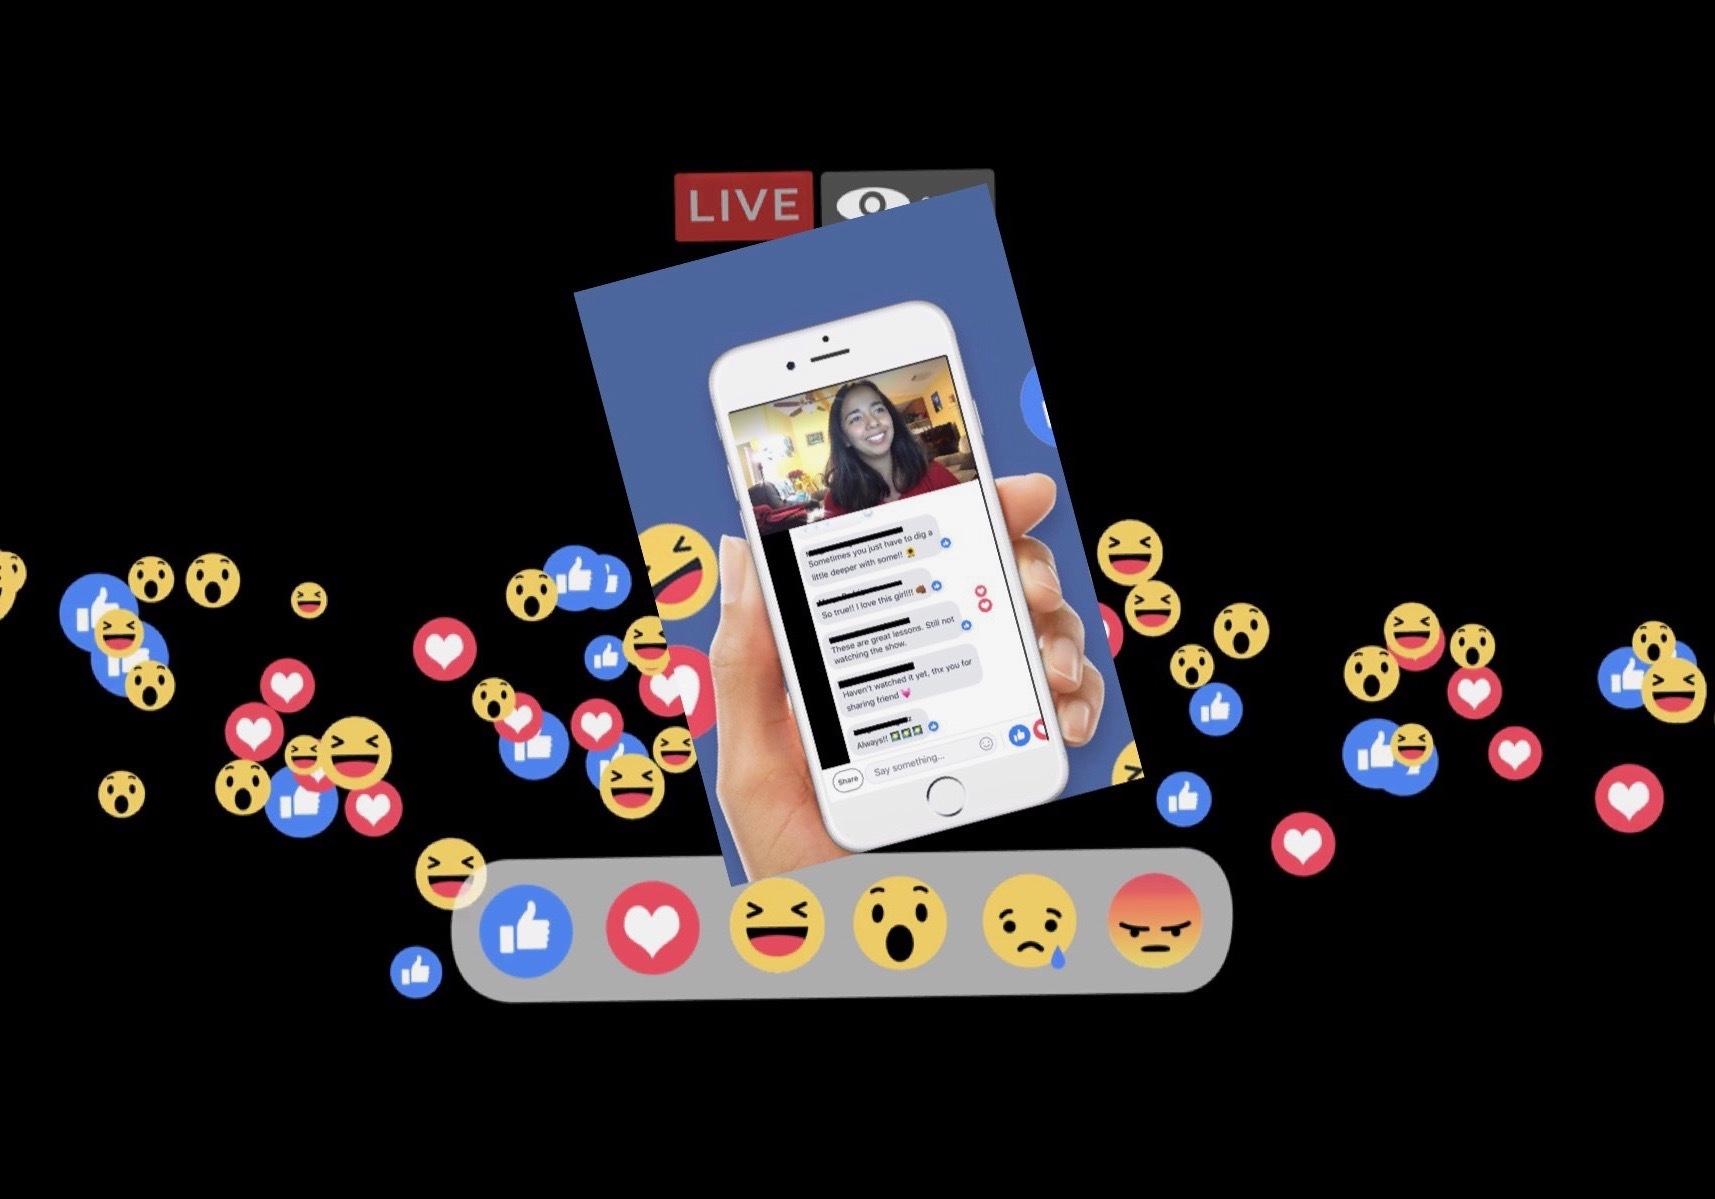 Lights, camera, FB LIVE!